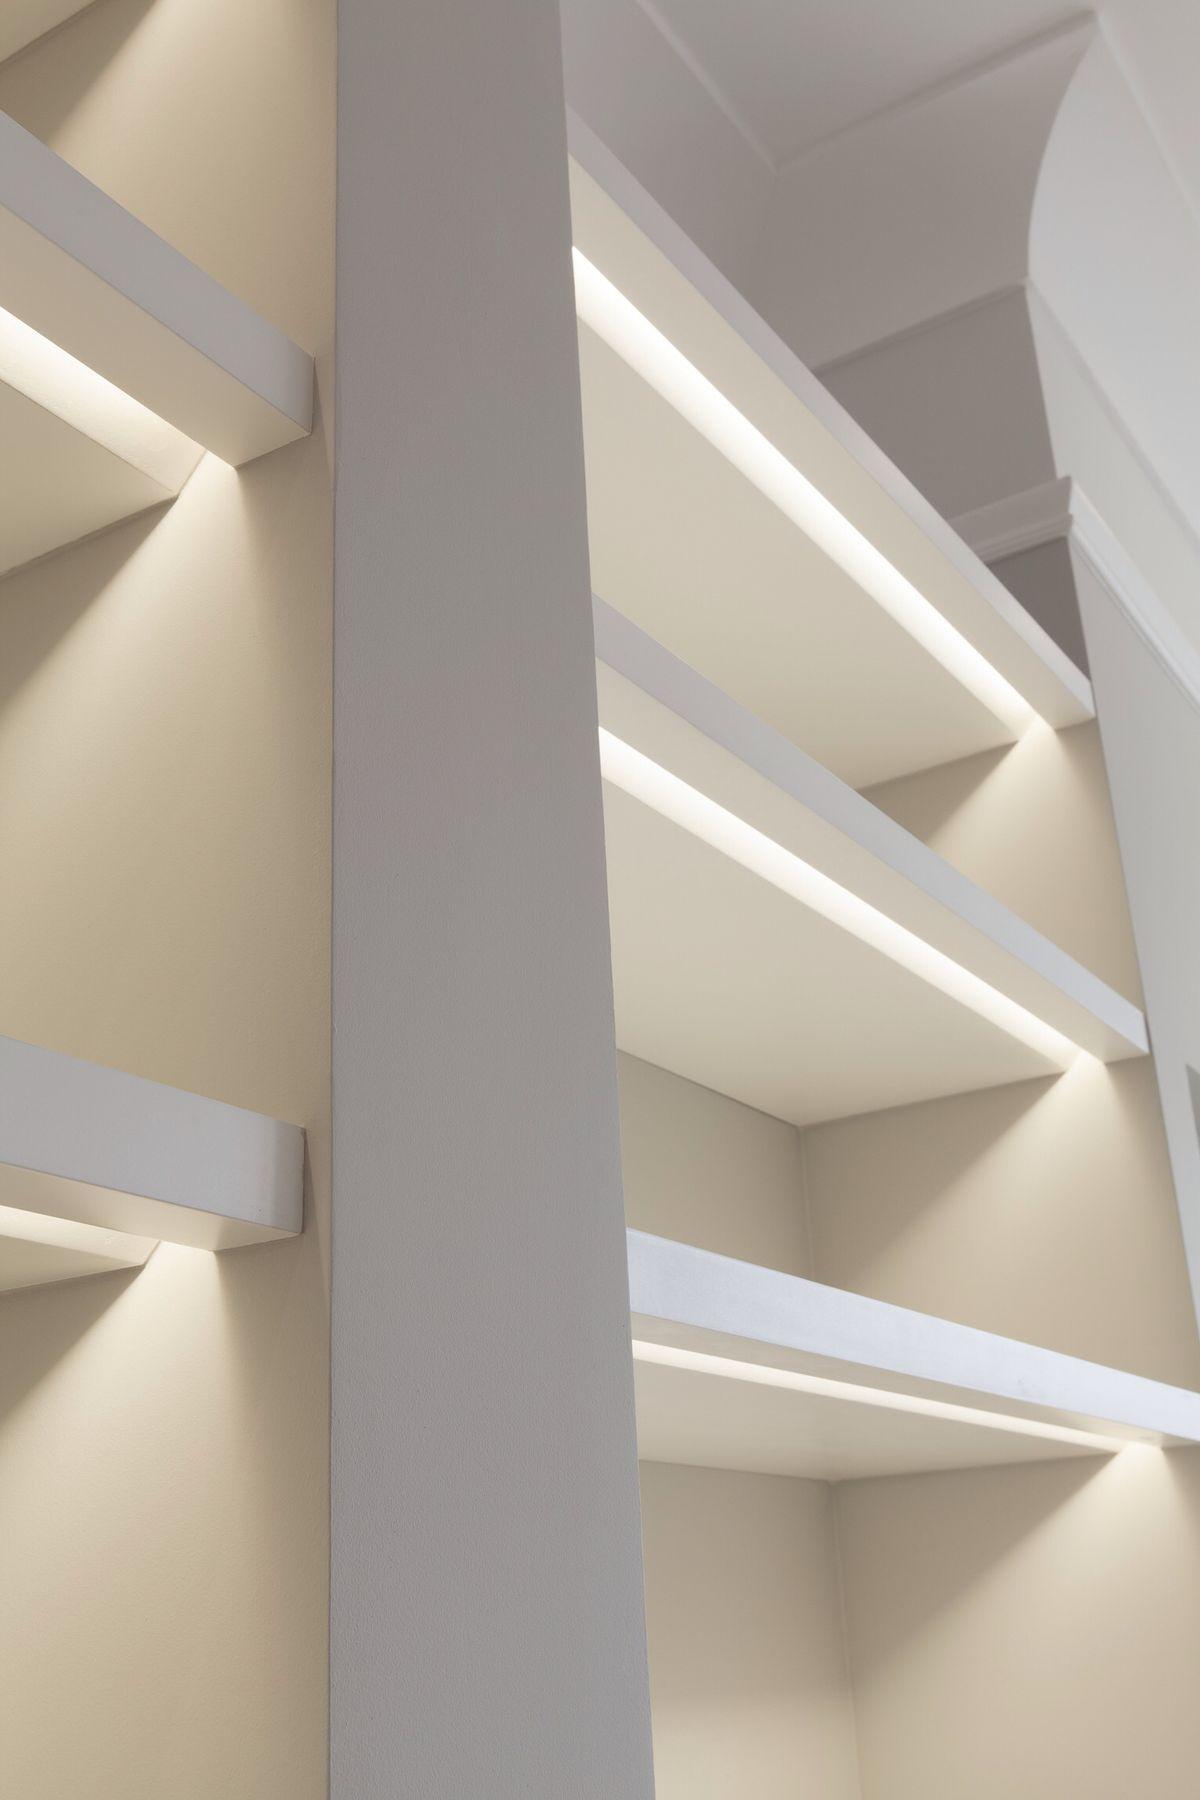 0d4390aa4ce167c7582c418cc7a7daf7 Jpg 1 200 1 800 Pixels Closet Lighting Interior Lighting Home Lighting